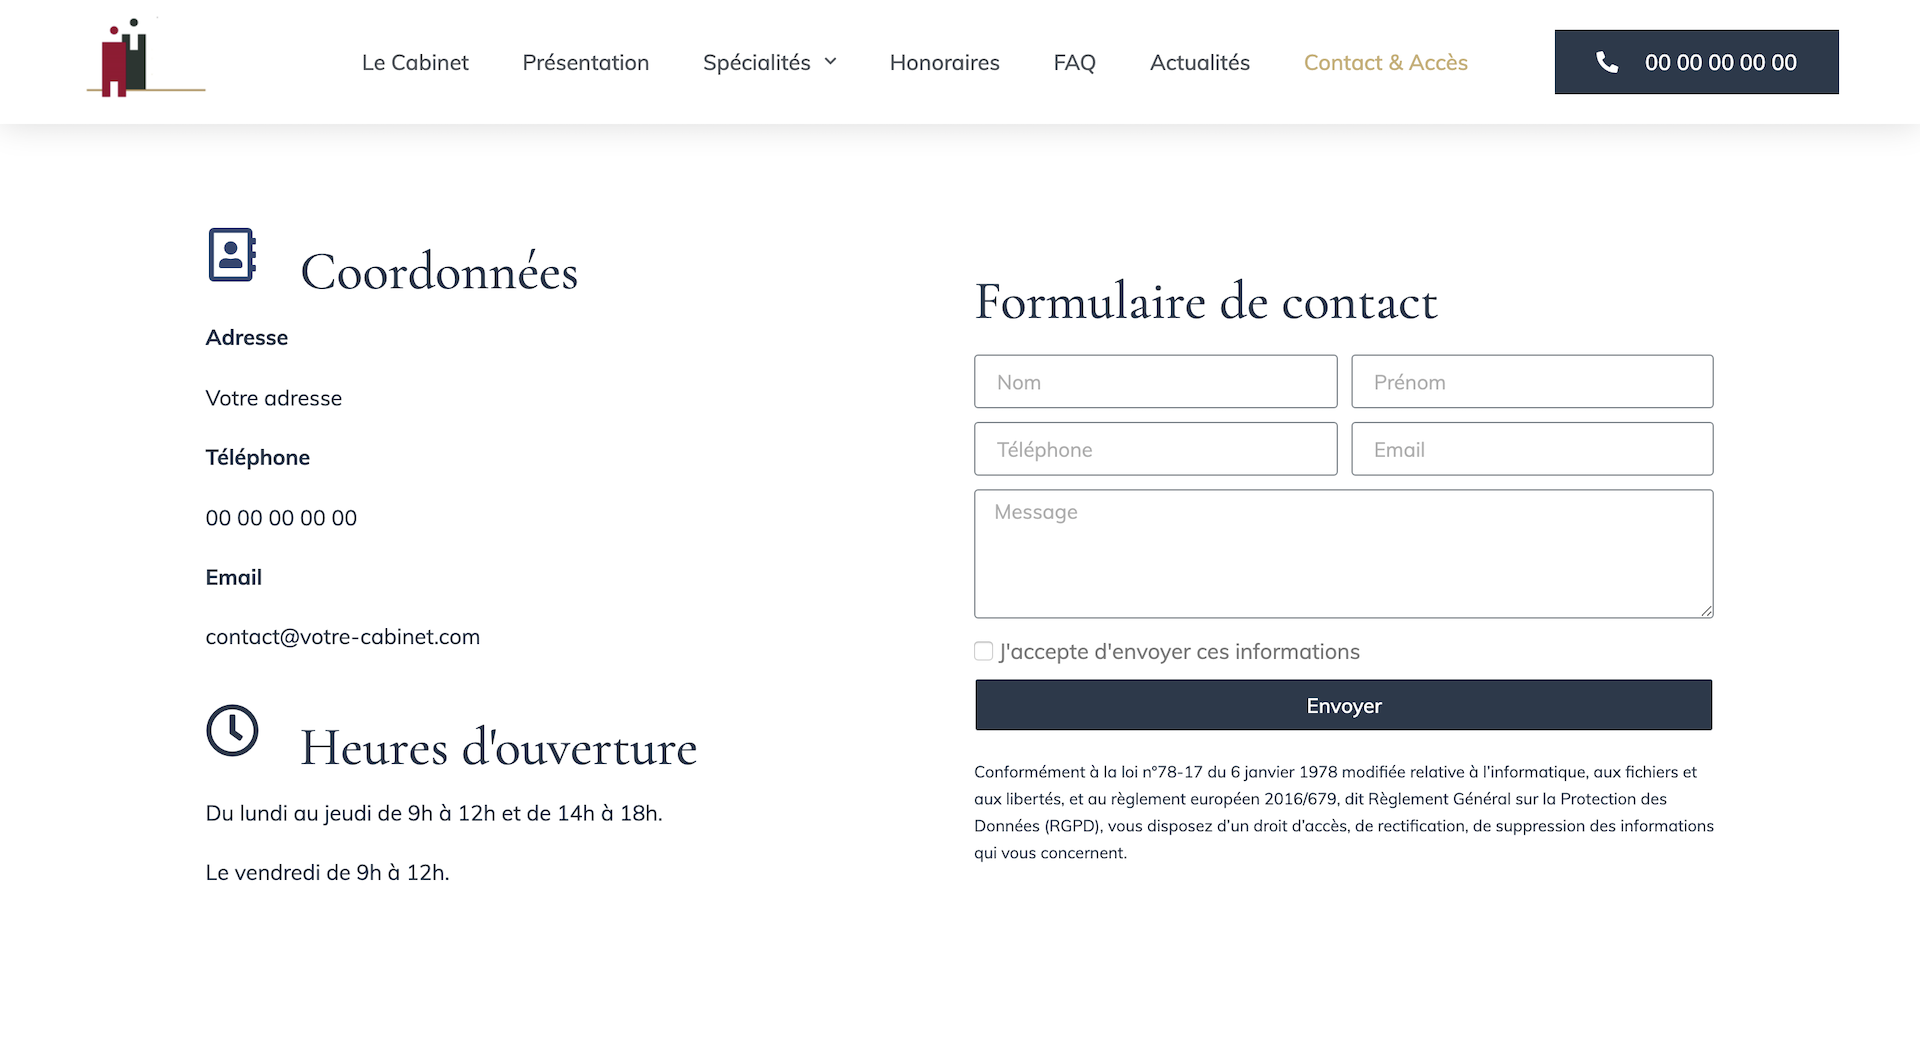 La page contact & accès